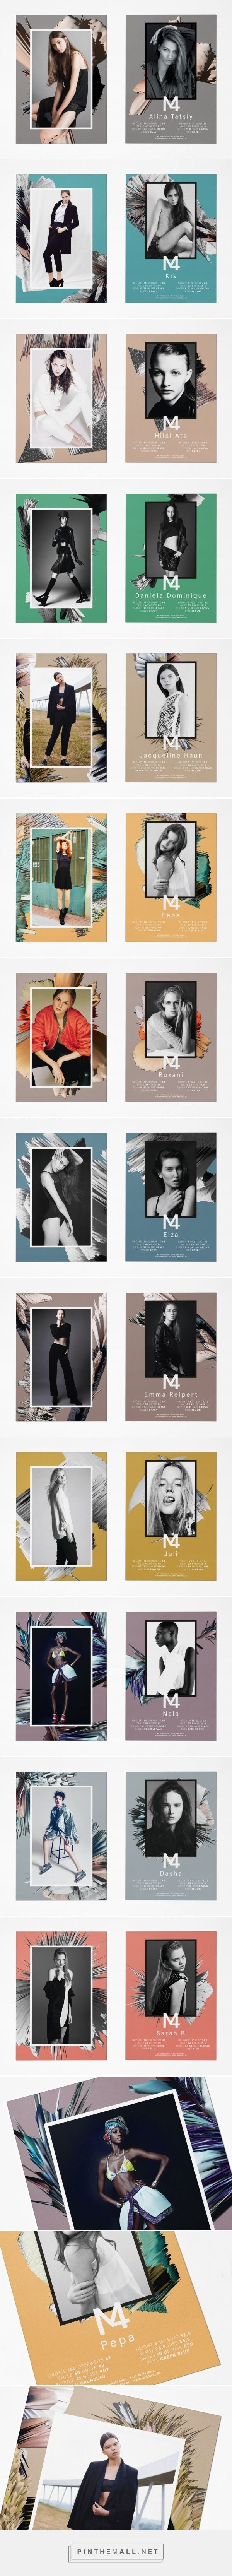 Designspiration — Design Inspiration | FOMM Invites ...